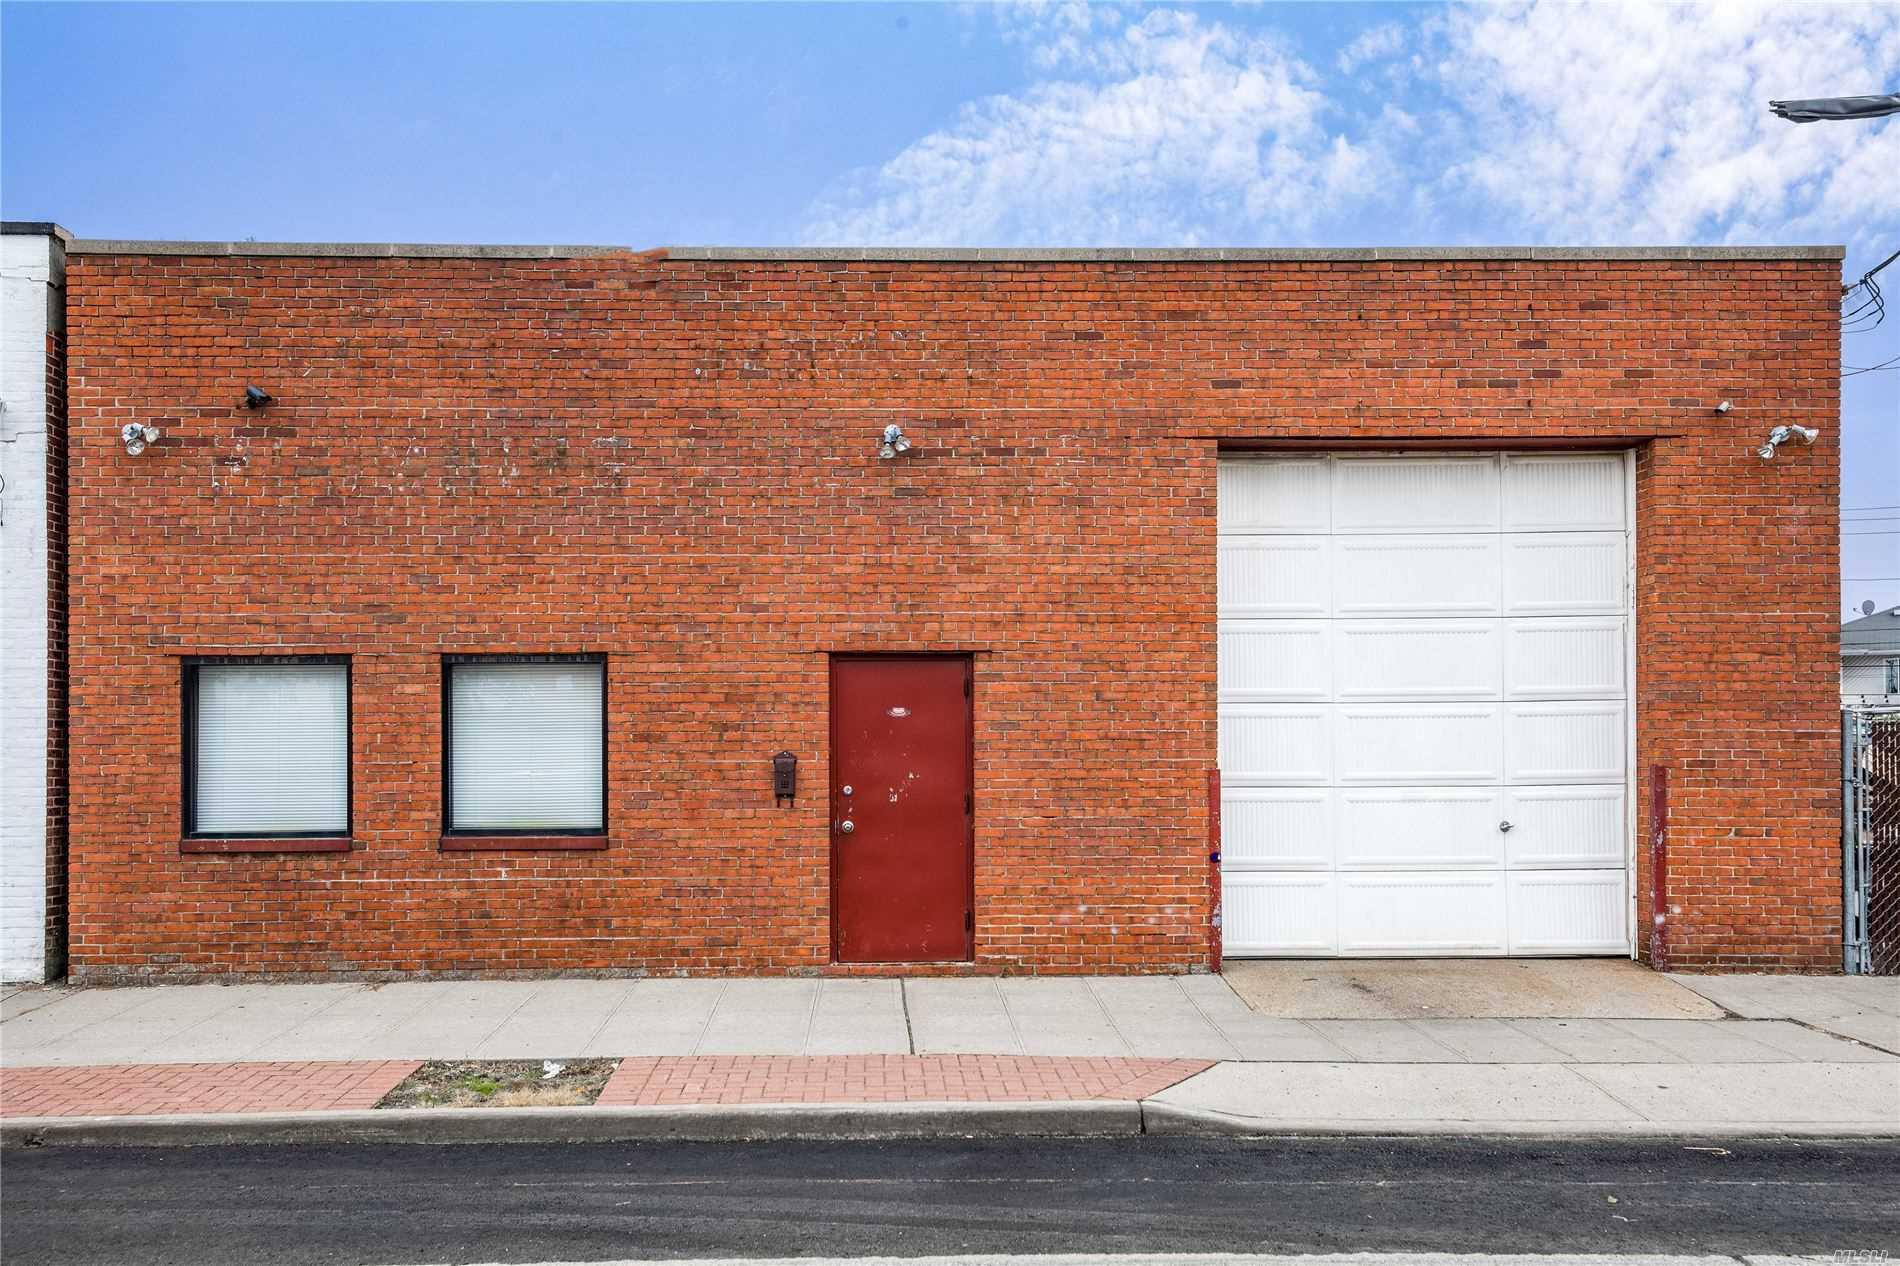 36 Davison Plz - E. Rockaway, New York